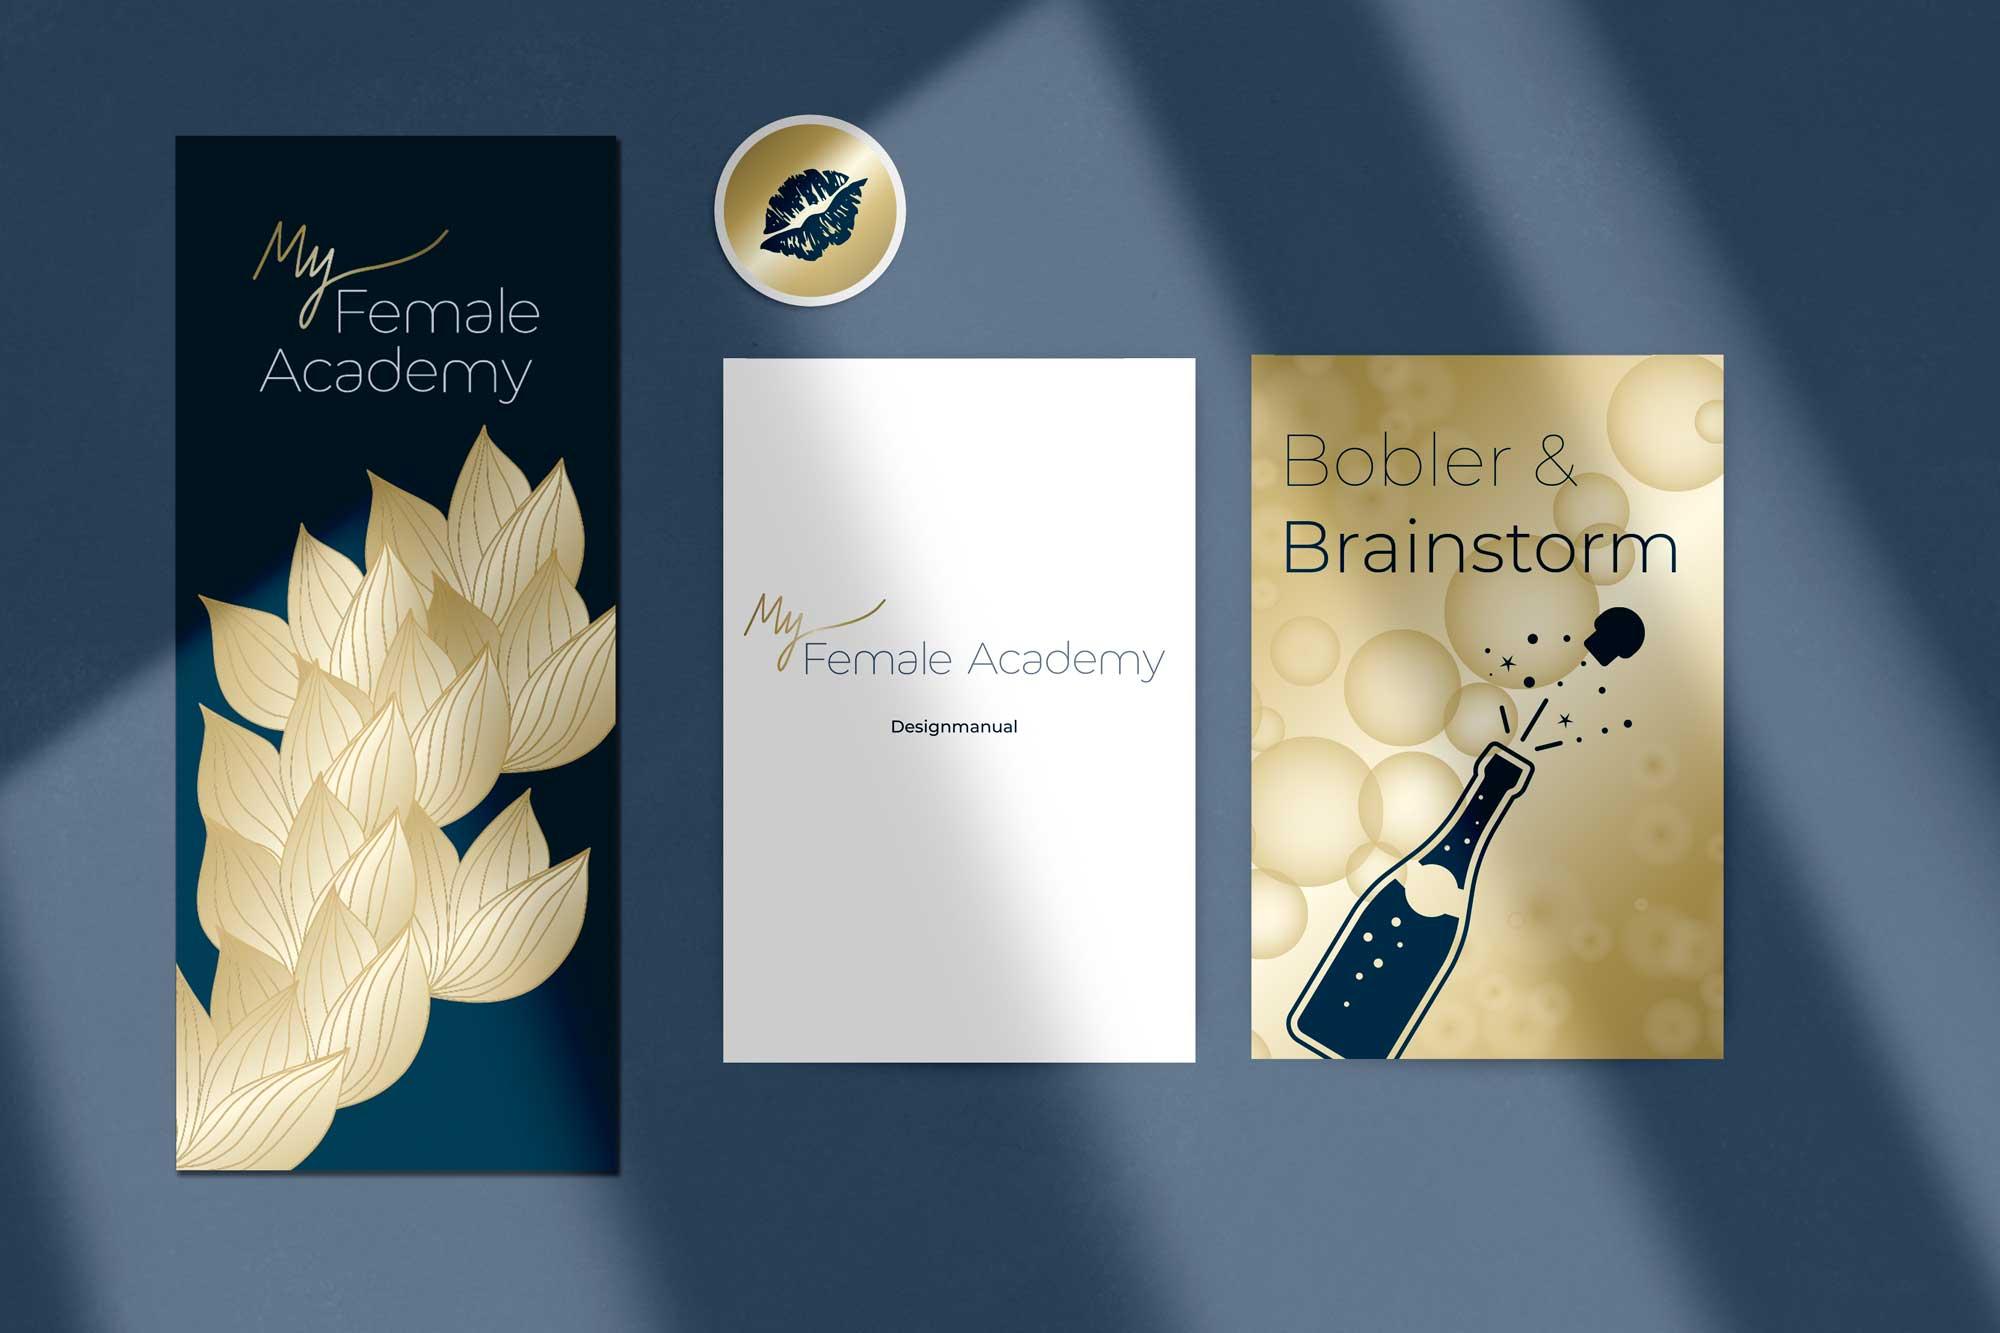 My Female Academy